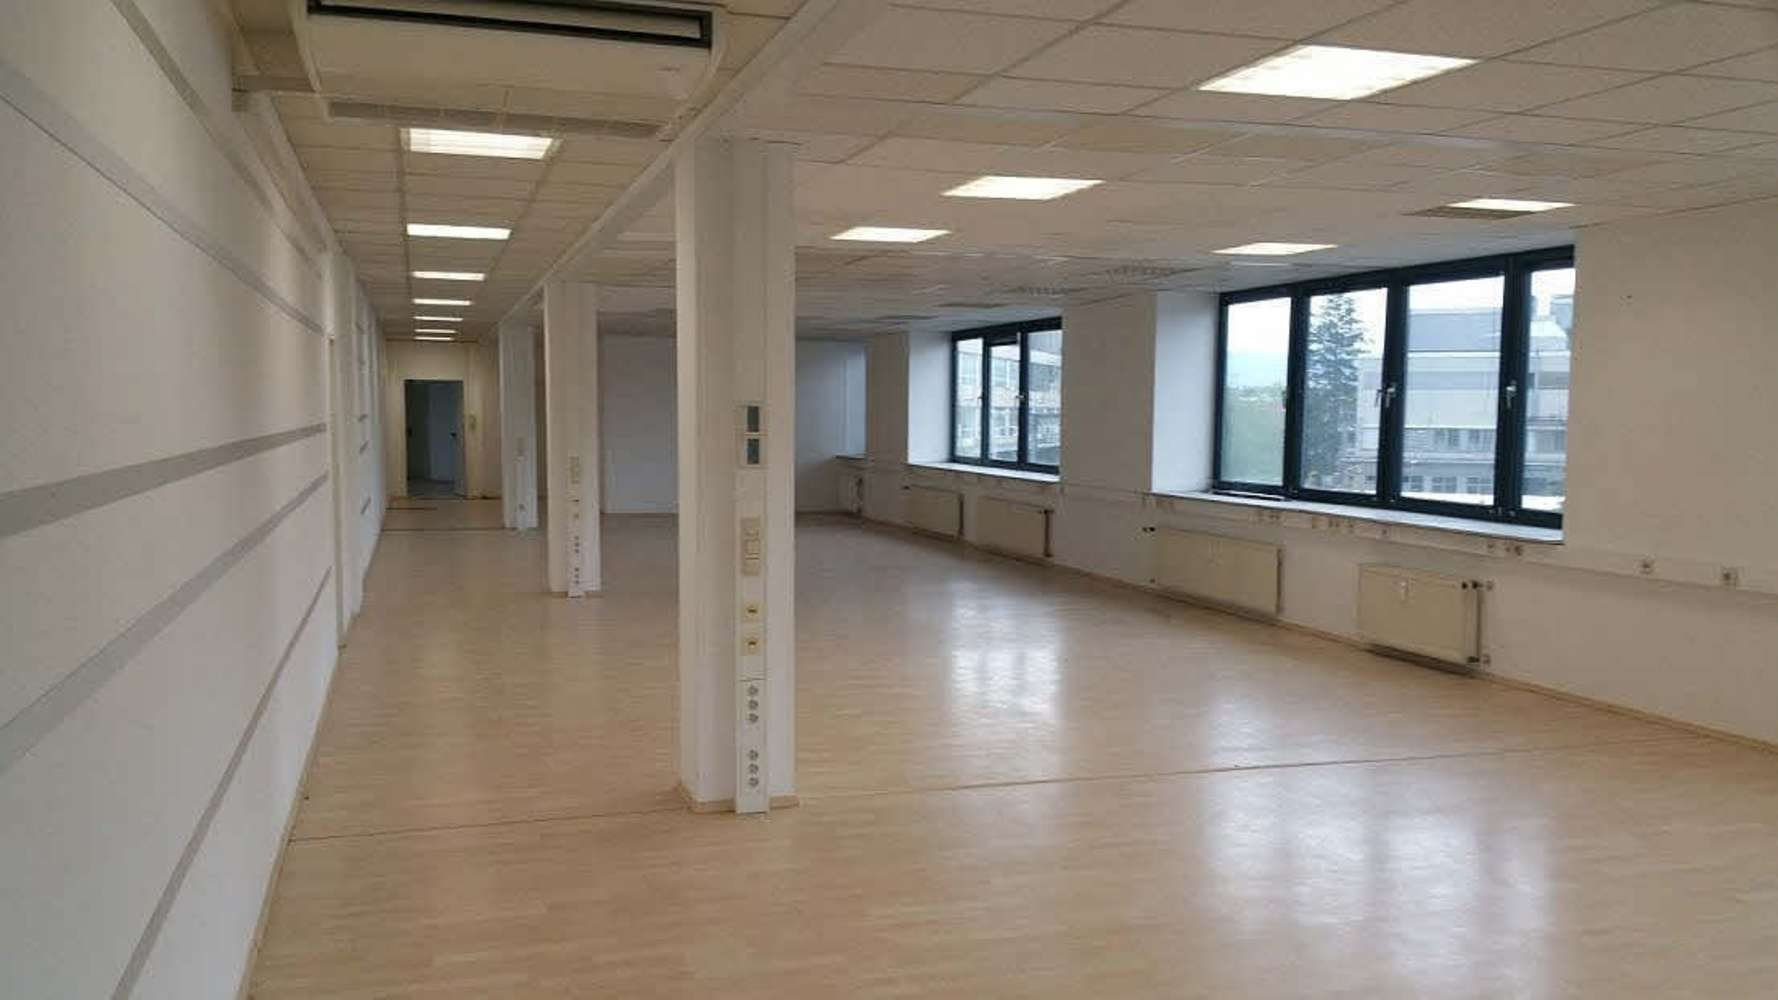 Büros Frankfurt am main, 60489 - Büro - Frankfurt am Main, Rödelheim - F1649 - 9422285